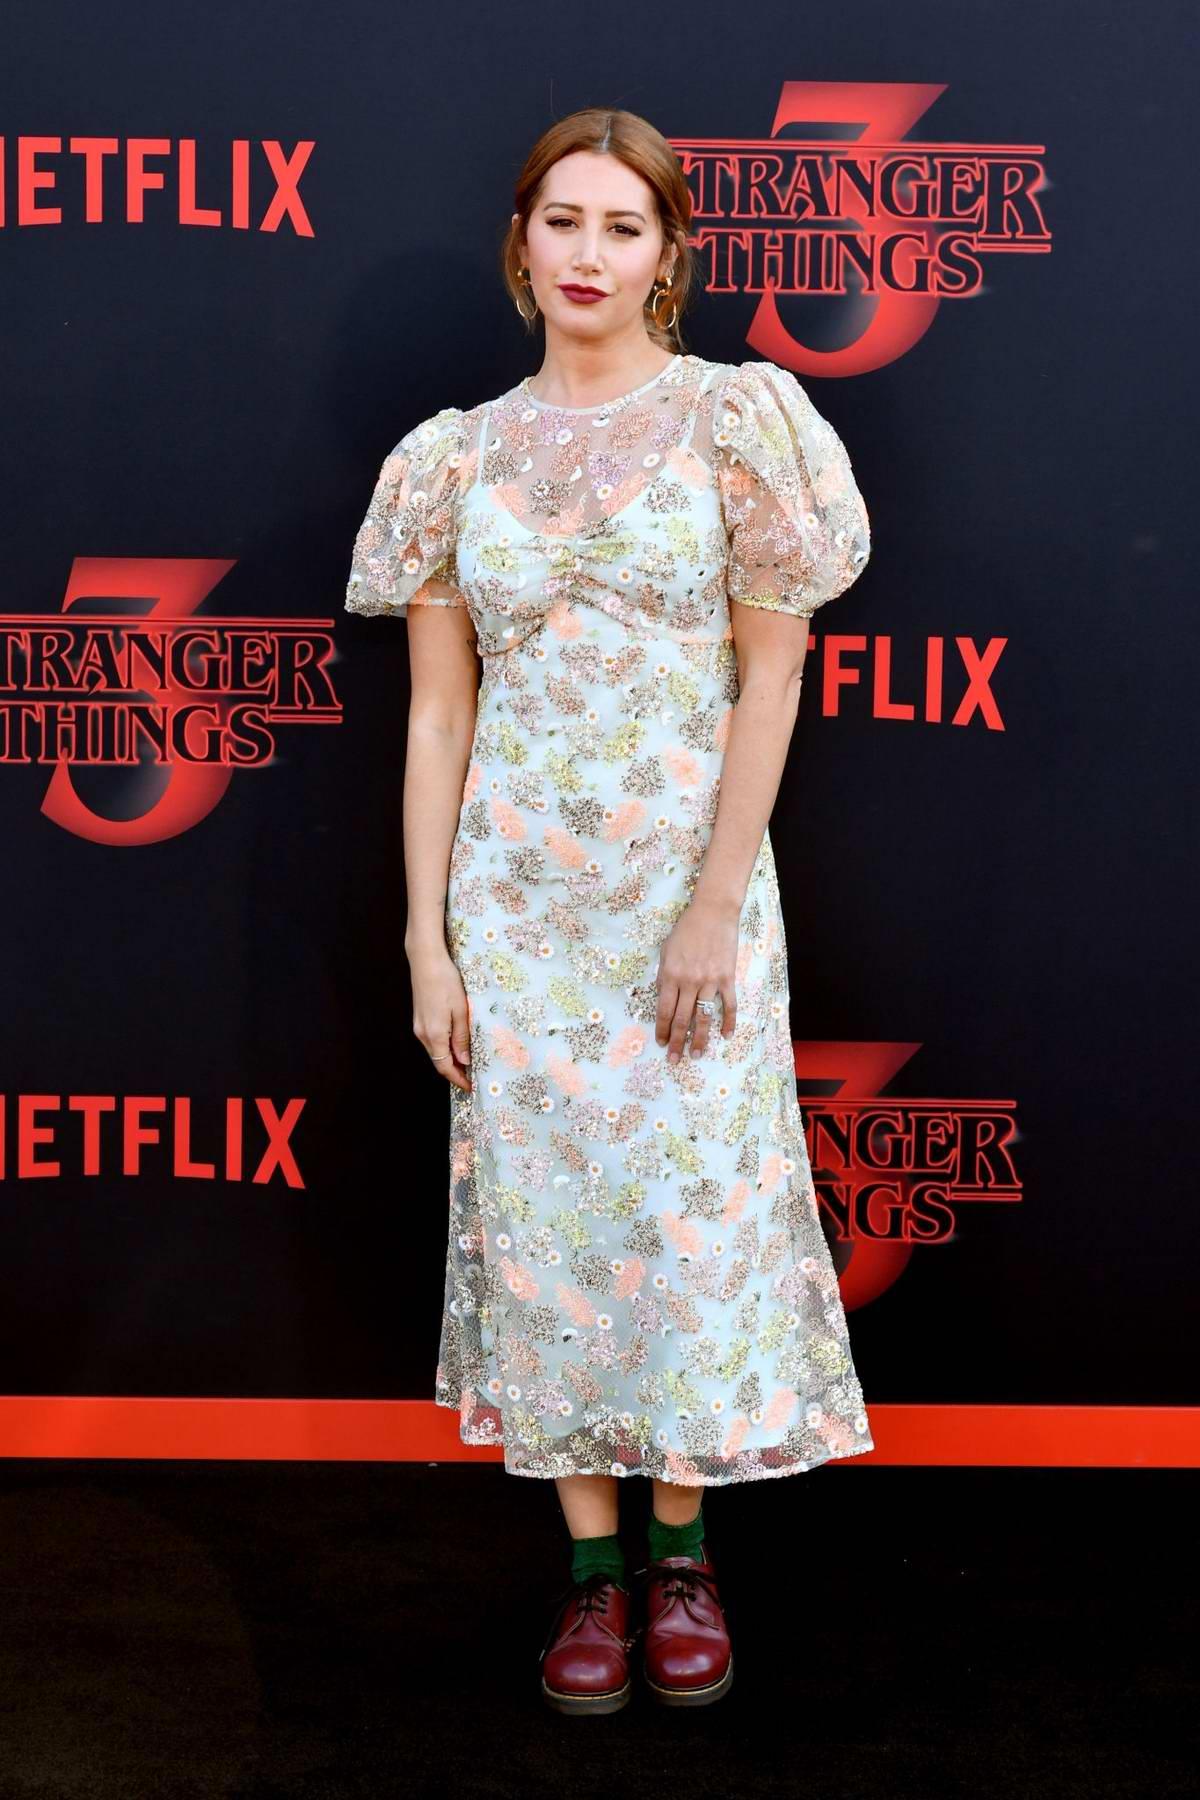 Ashley Tisdale attends the premiere of Netflix's 'Stranger Things' Season 3 in Santa Monica, California